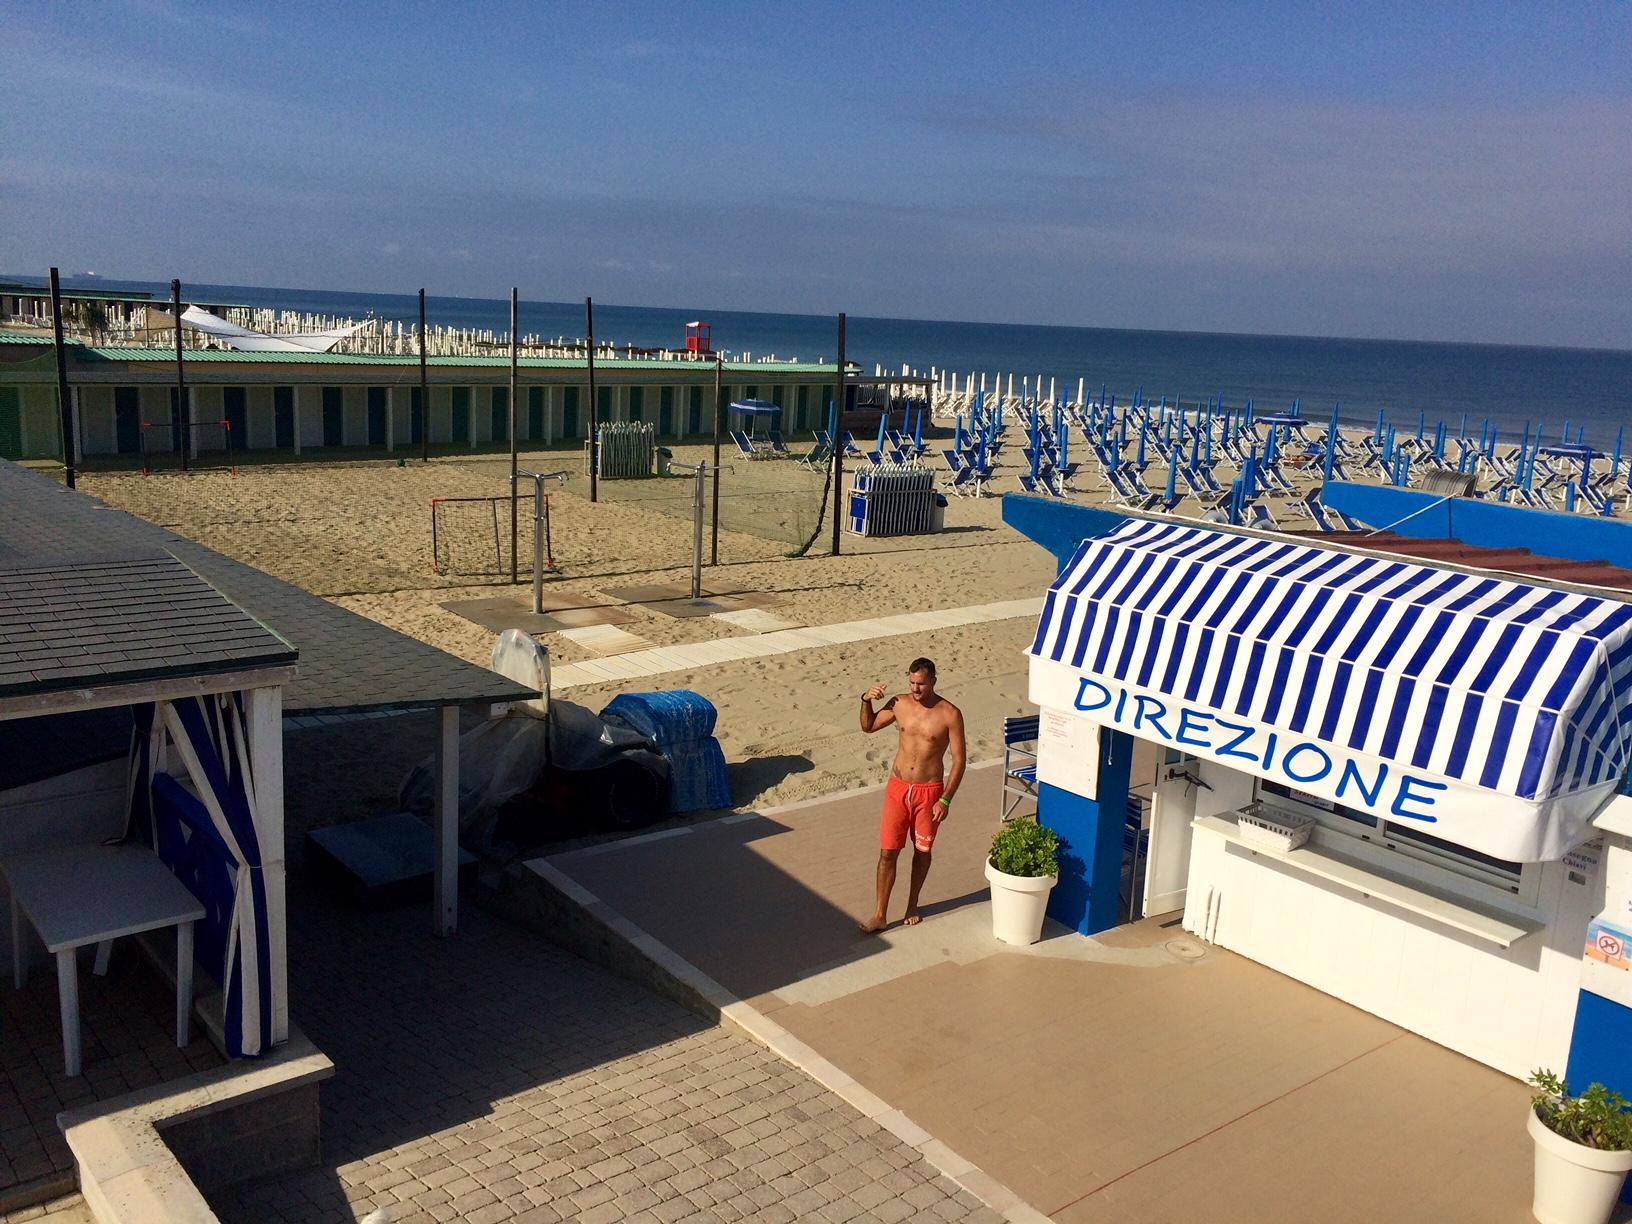 La spiaggia a tirrenia pisa u2013 bagno rosa u2013 stabilimento balneare